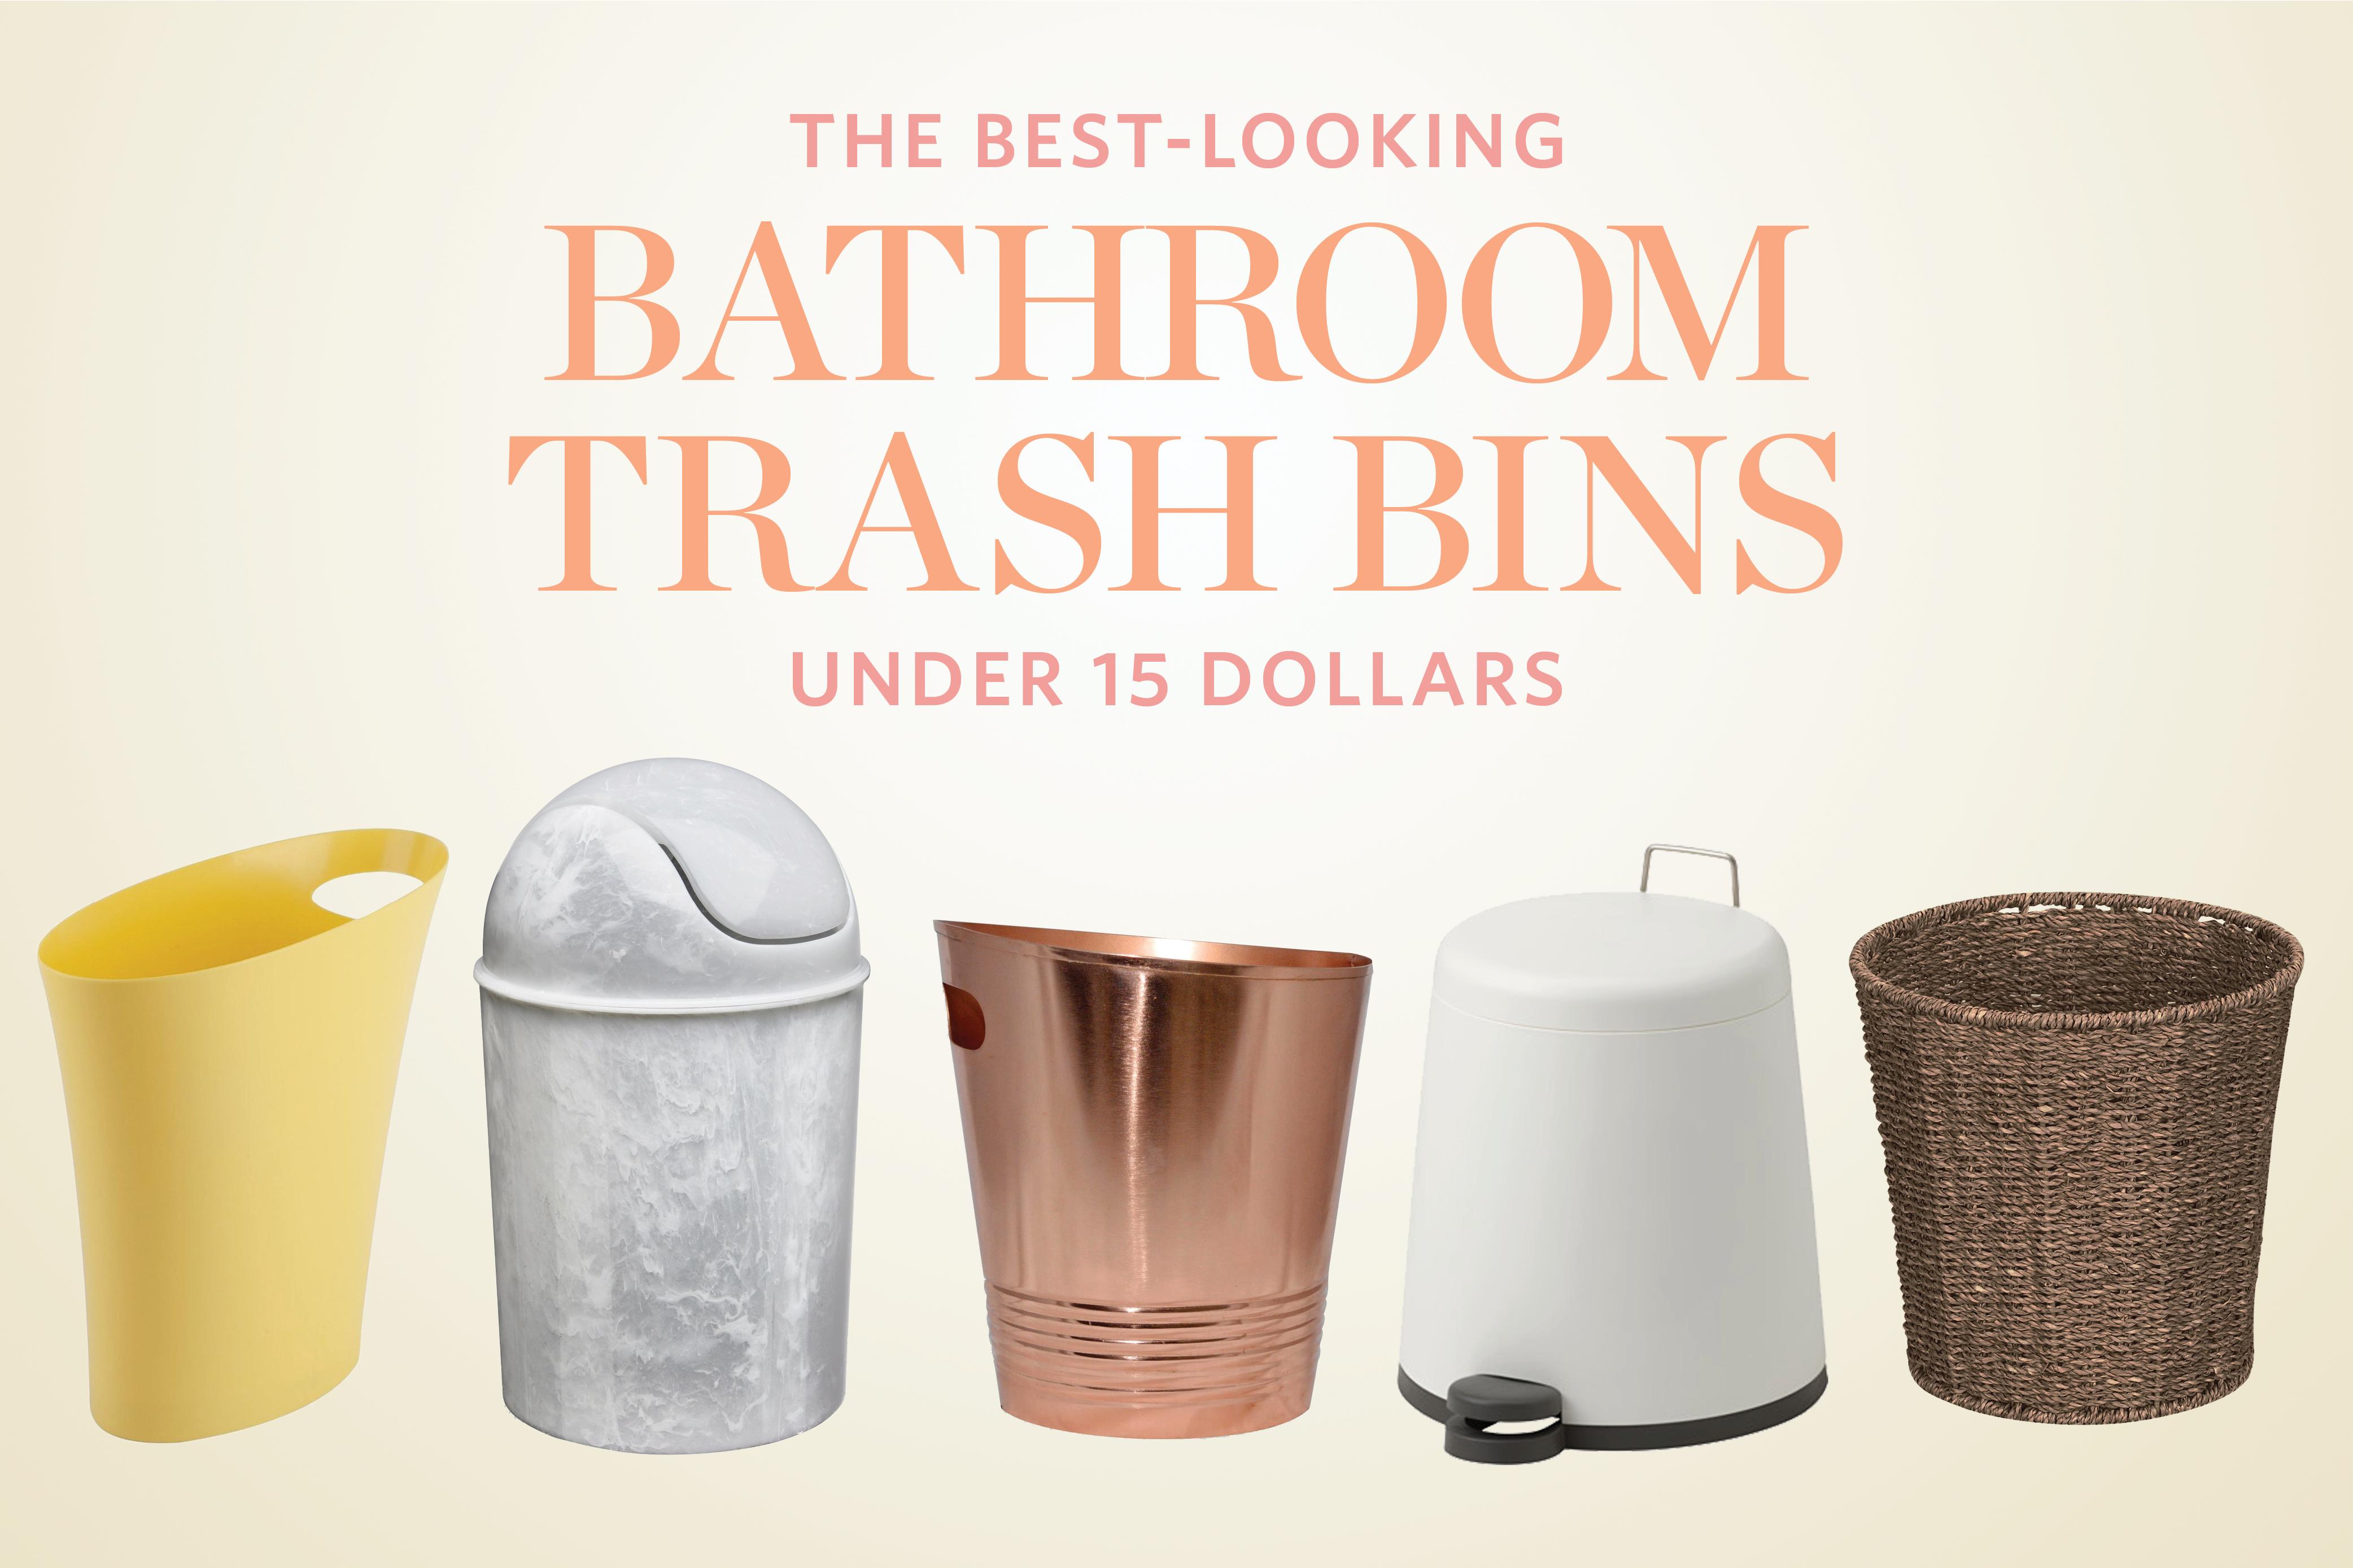 Stylish Small Bathroom Trash Cans For, Decorative Bathroom Trash Cans With Lids